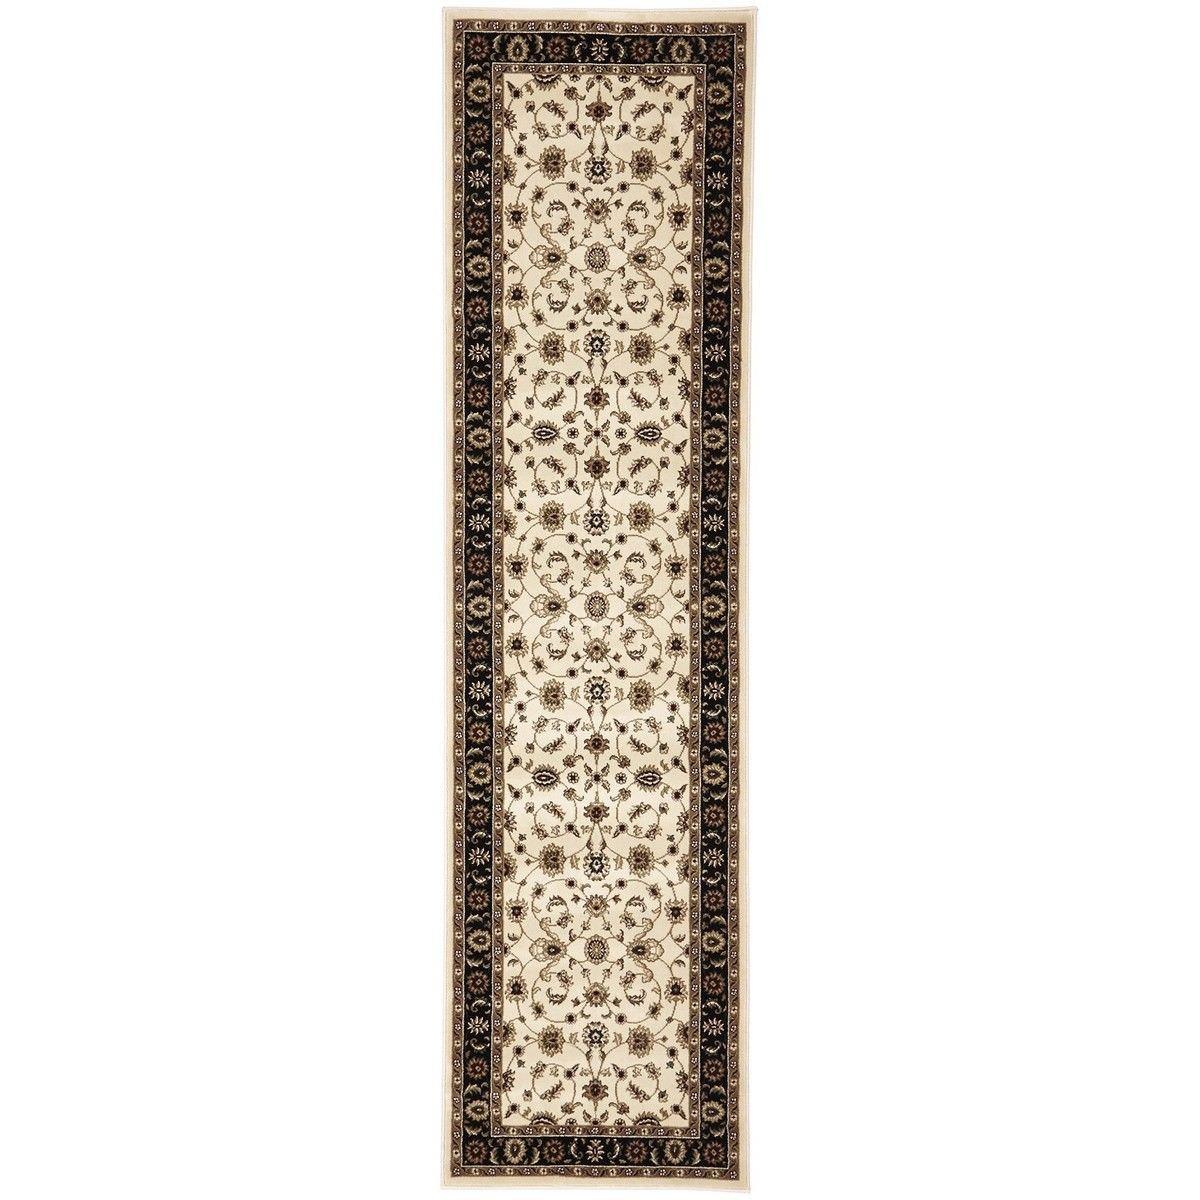 Sydney Classic Turkish Made Oriental Runner Rug, 400x80cm, Ivory / Black